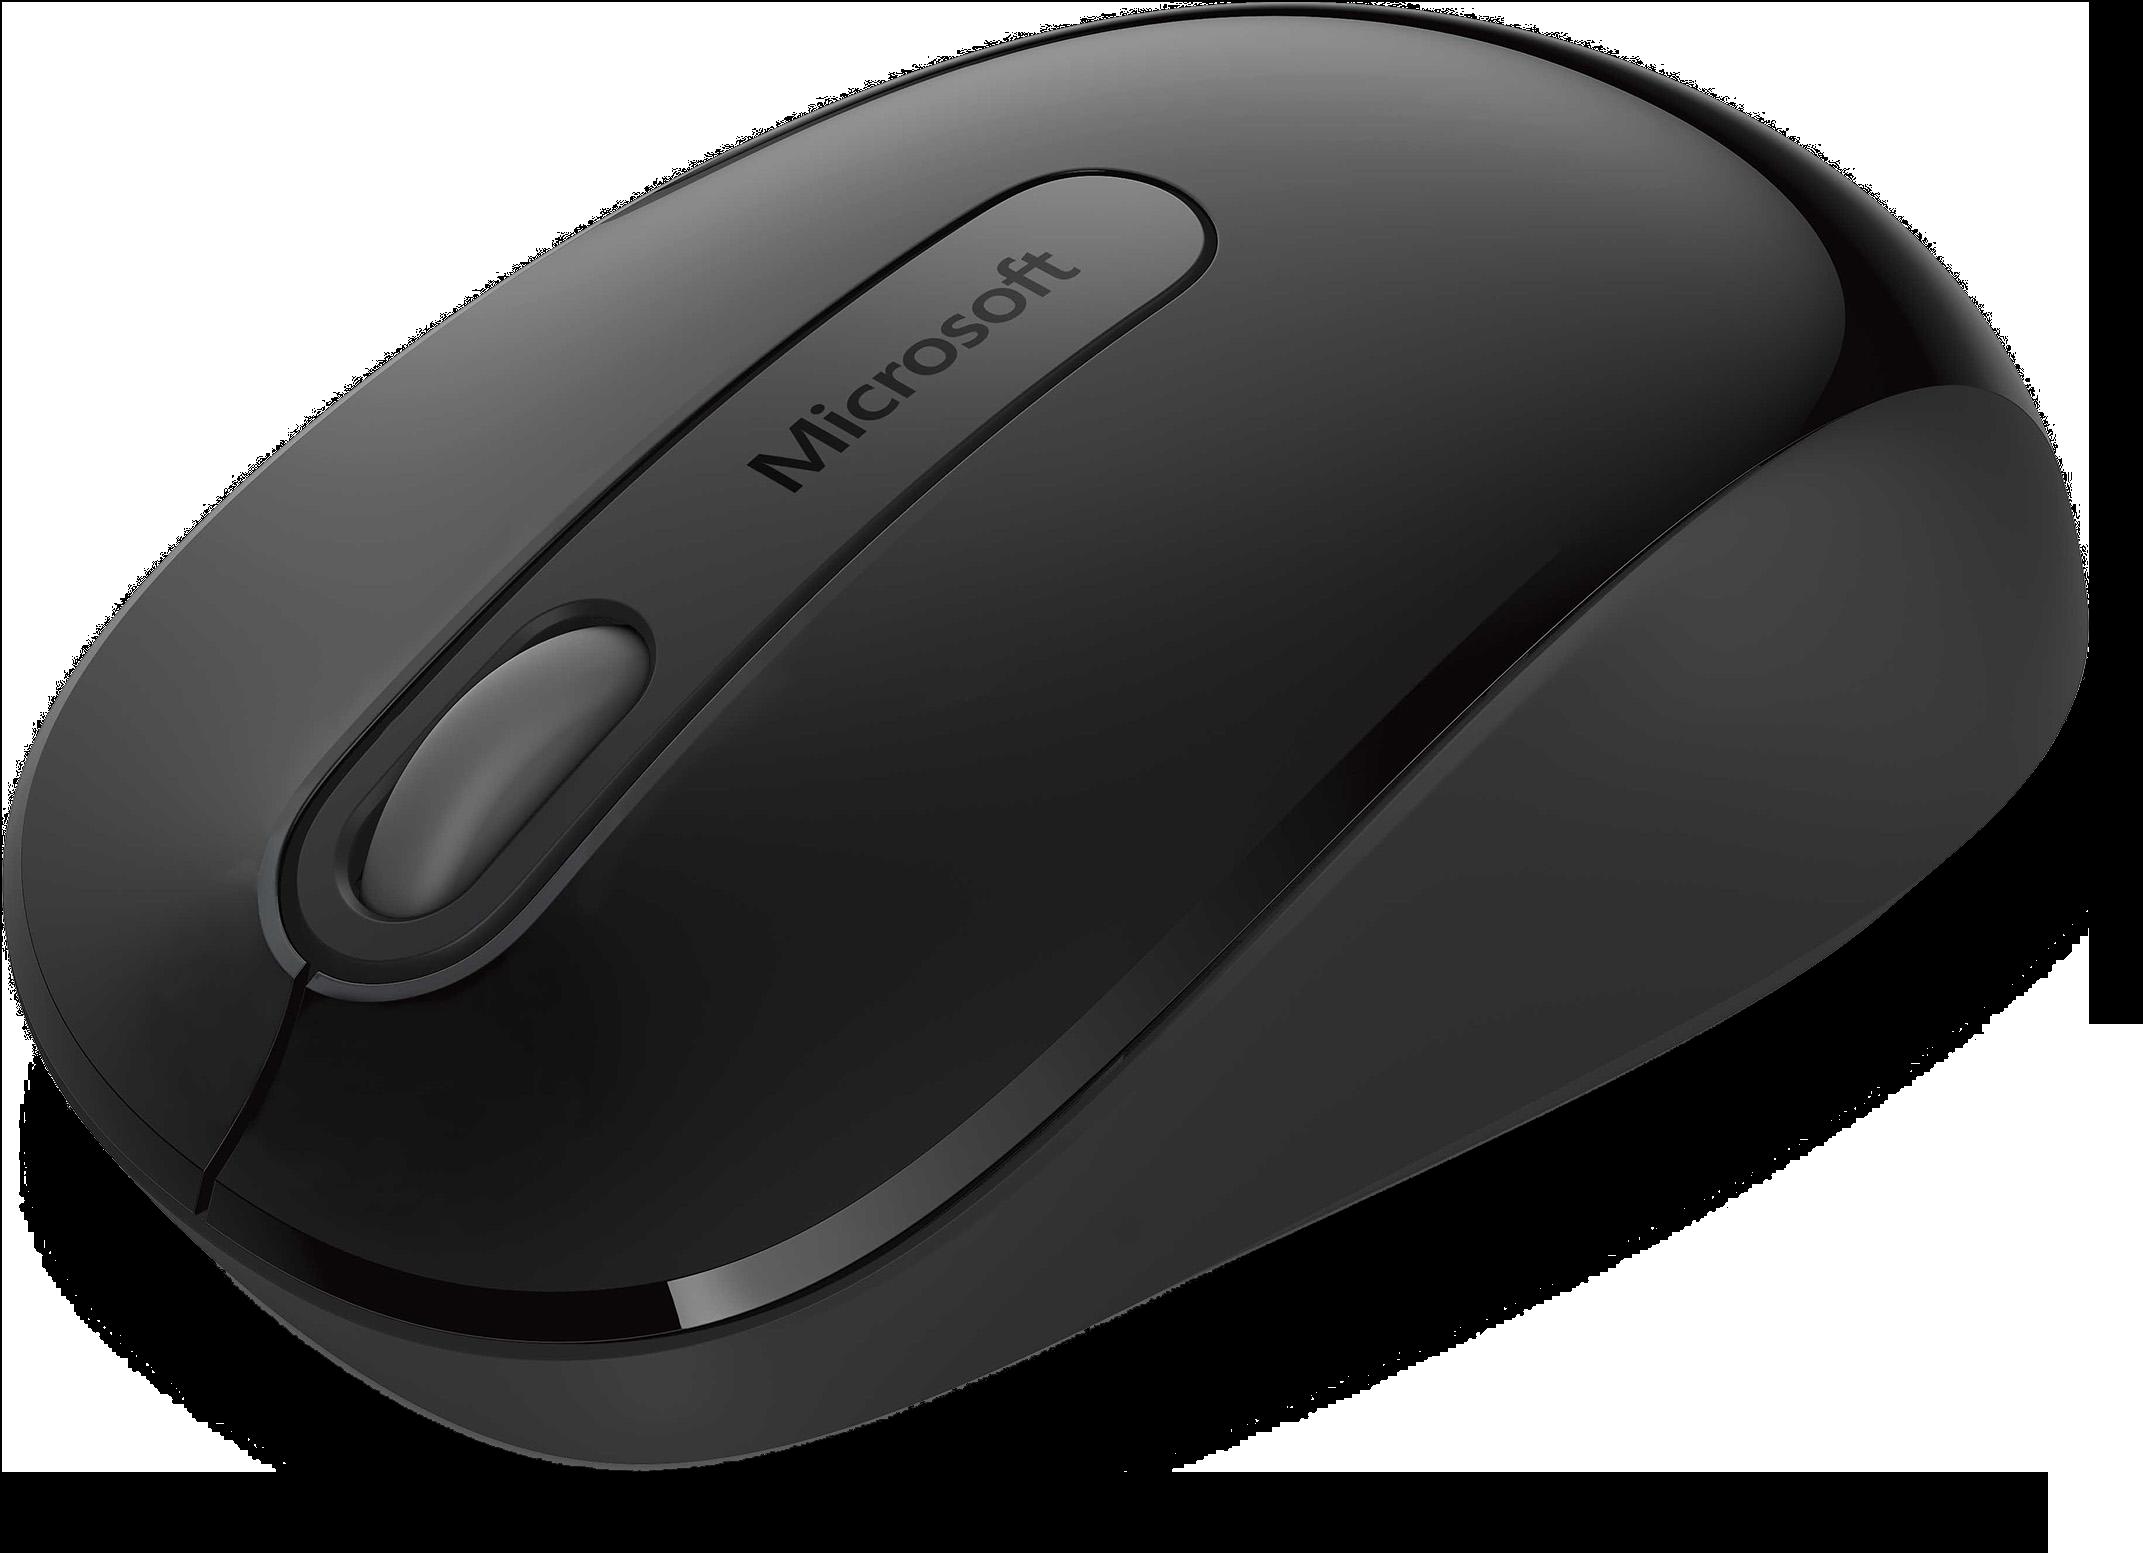 microsoft-wireless-mouse-900